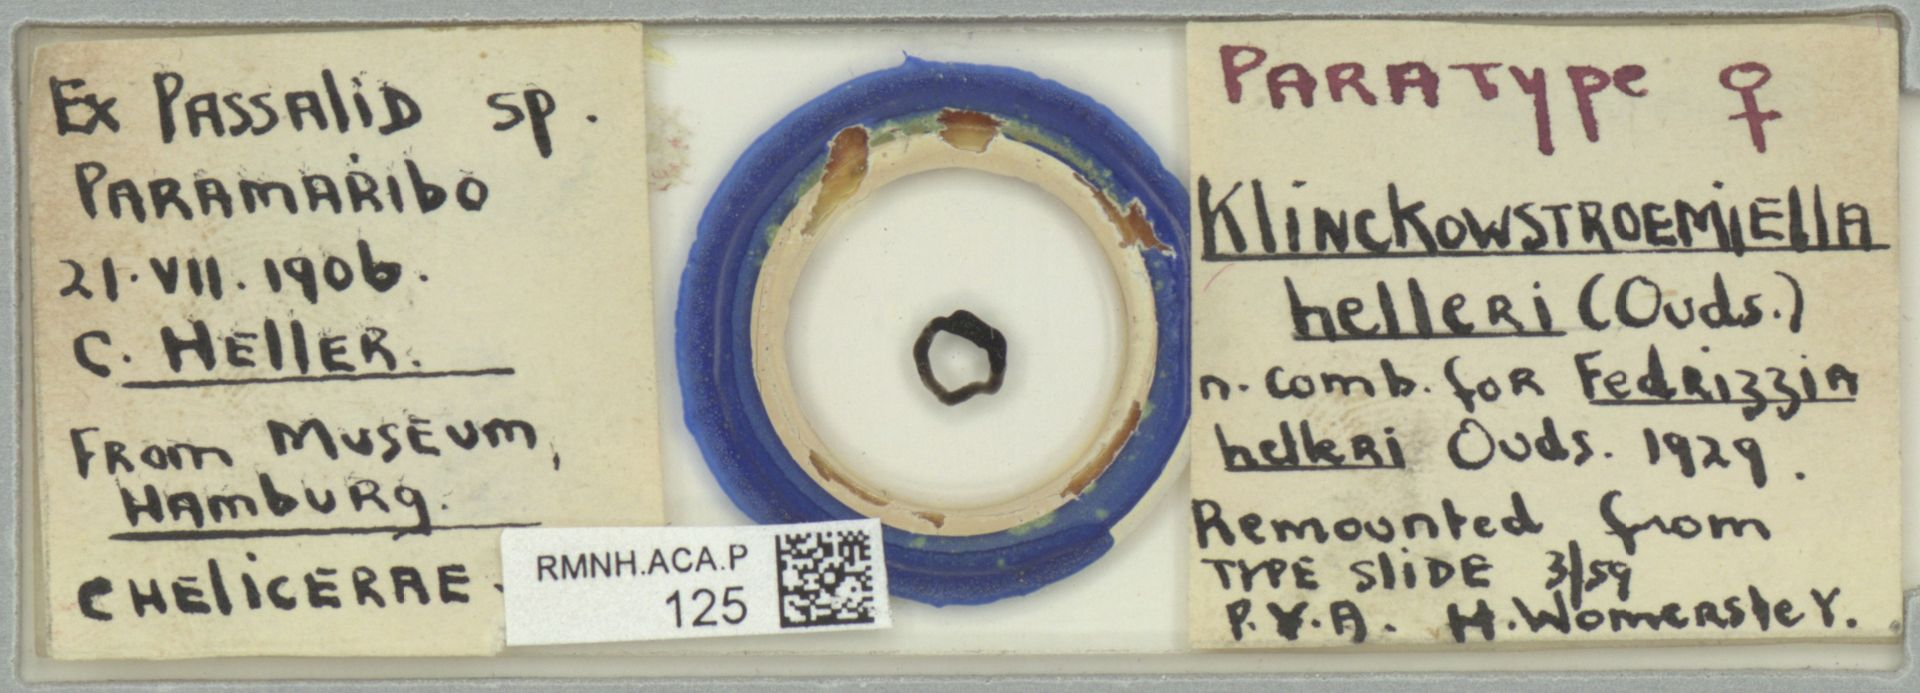 RMNH.ACA.P.125 | Klinckowstroemiella helleri Oudemans